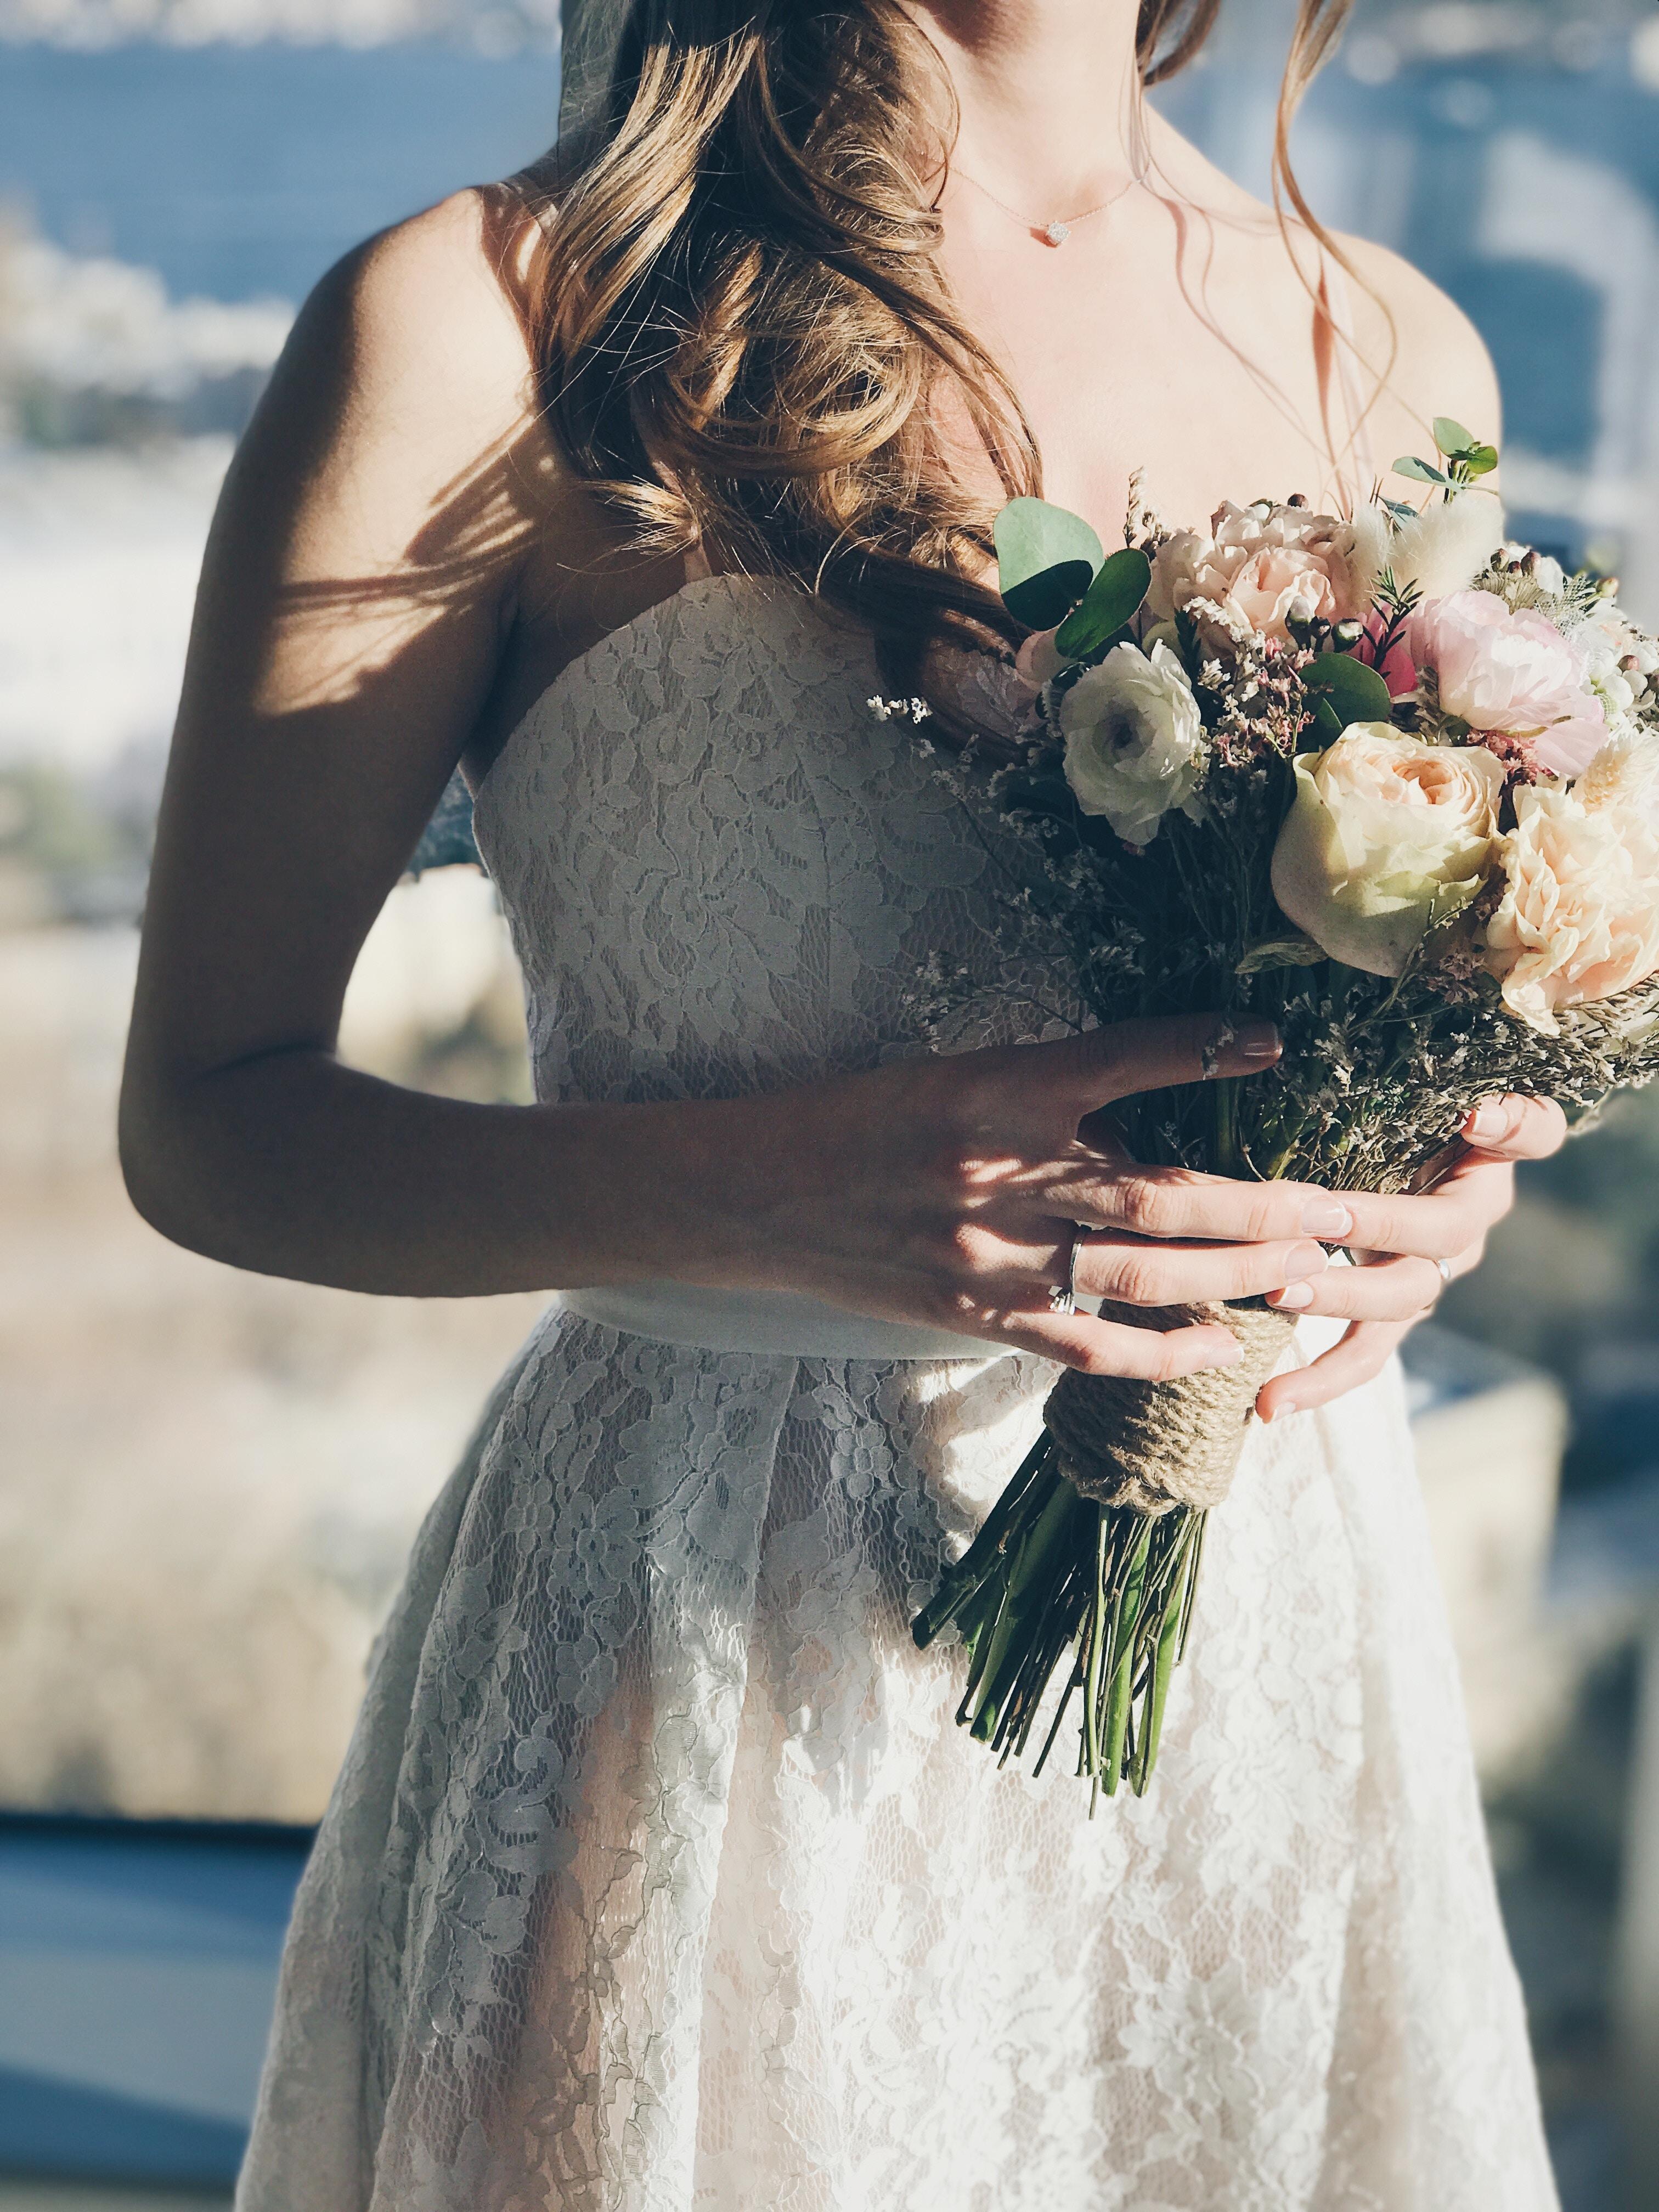 Alternatives to wedding dress shops